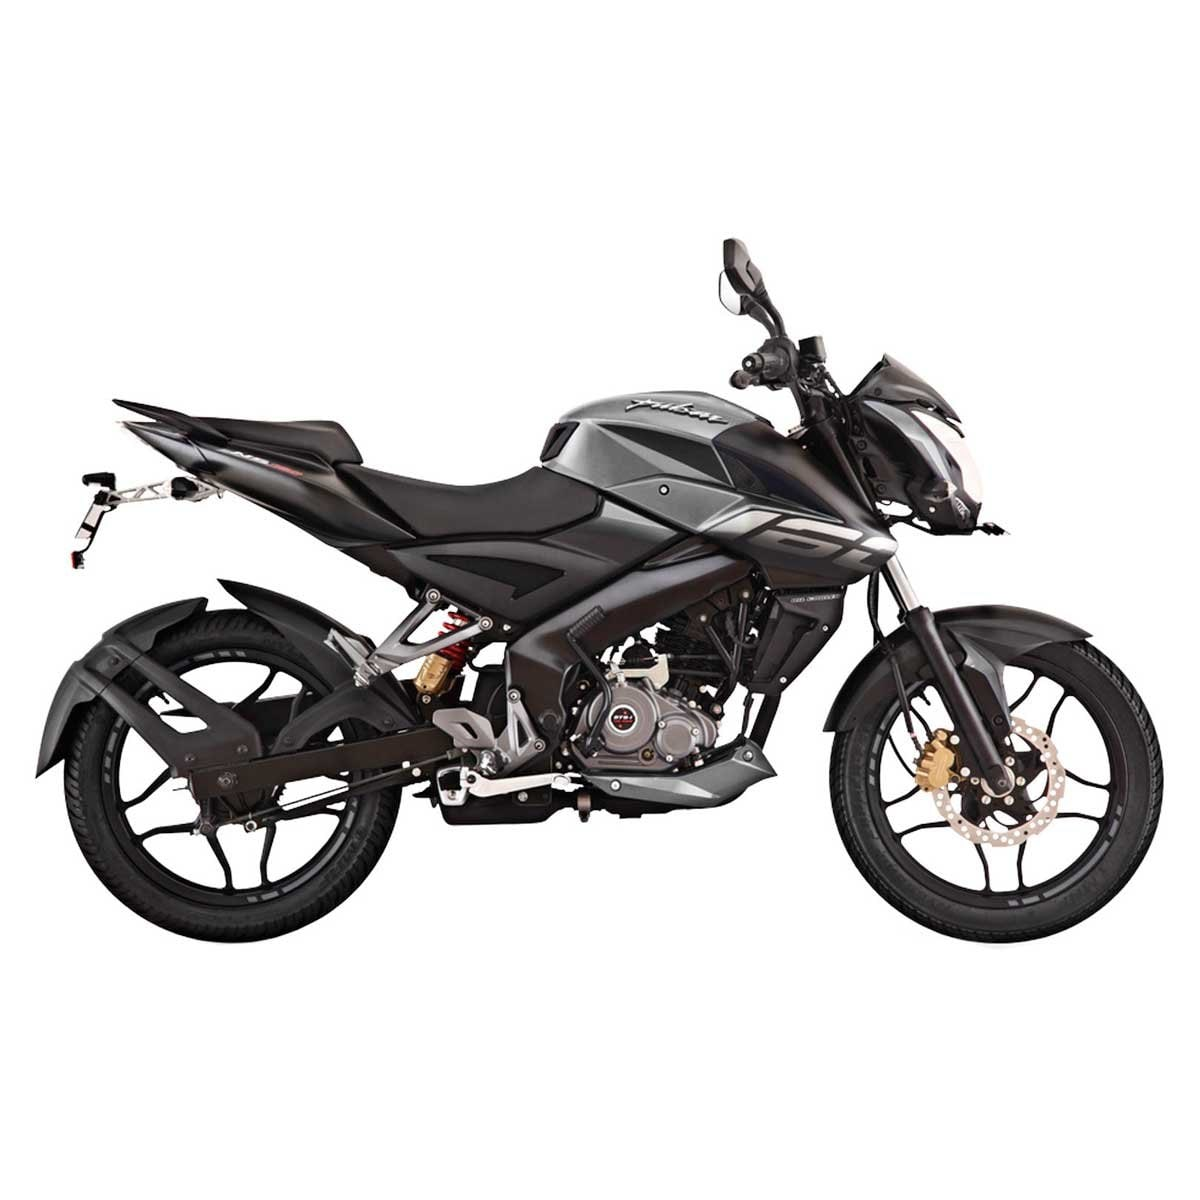 Motocicleta Pulsar Ns 160 Cc Gris Bajaj